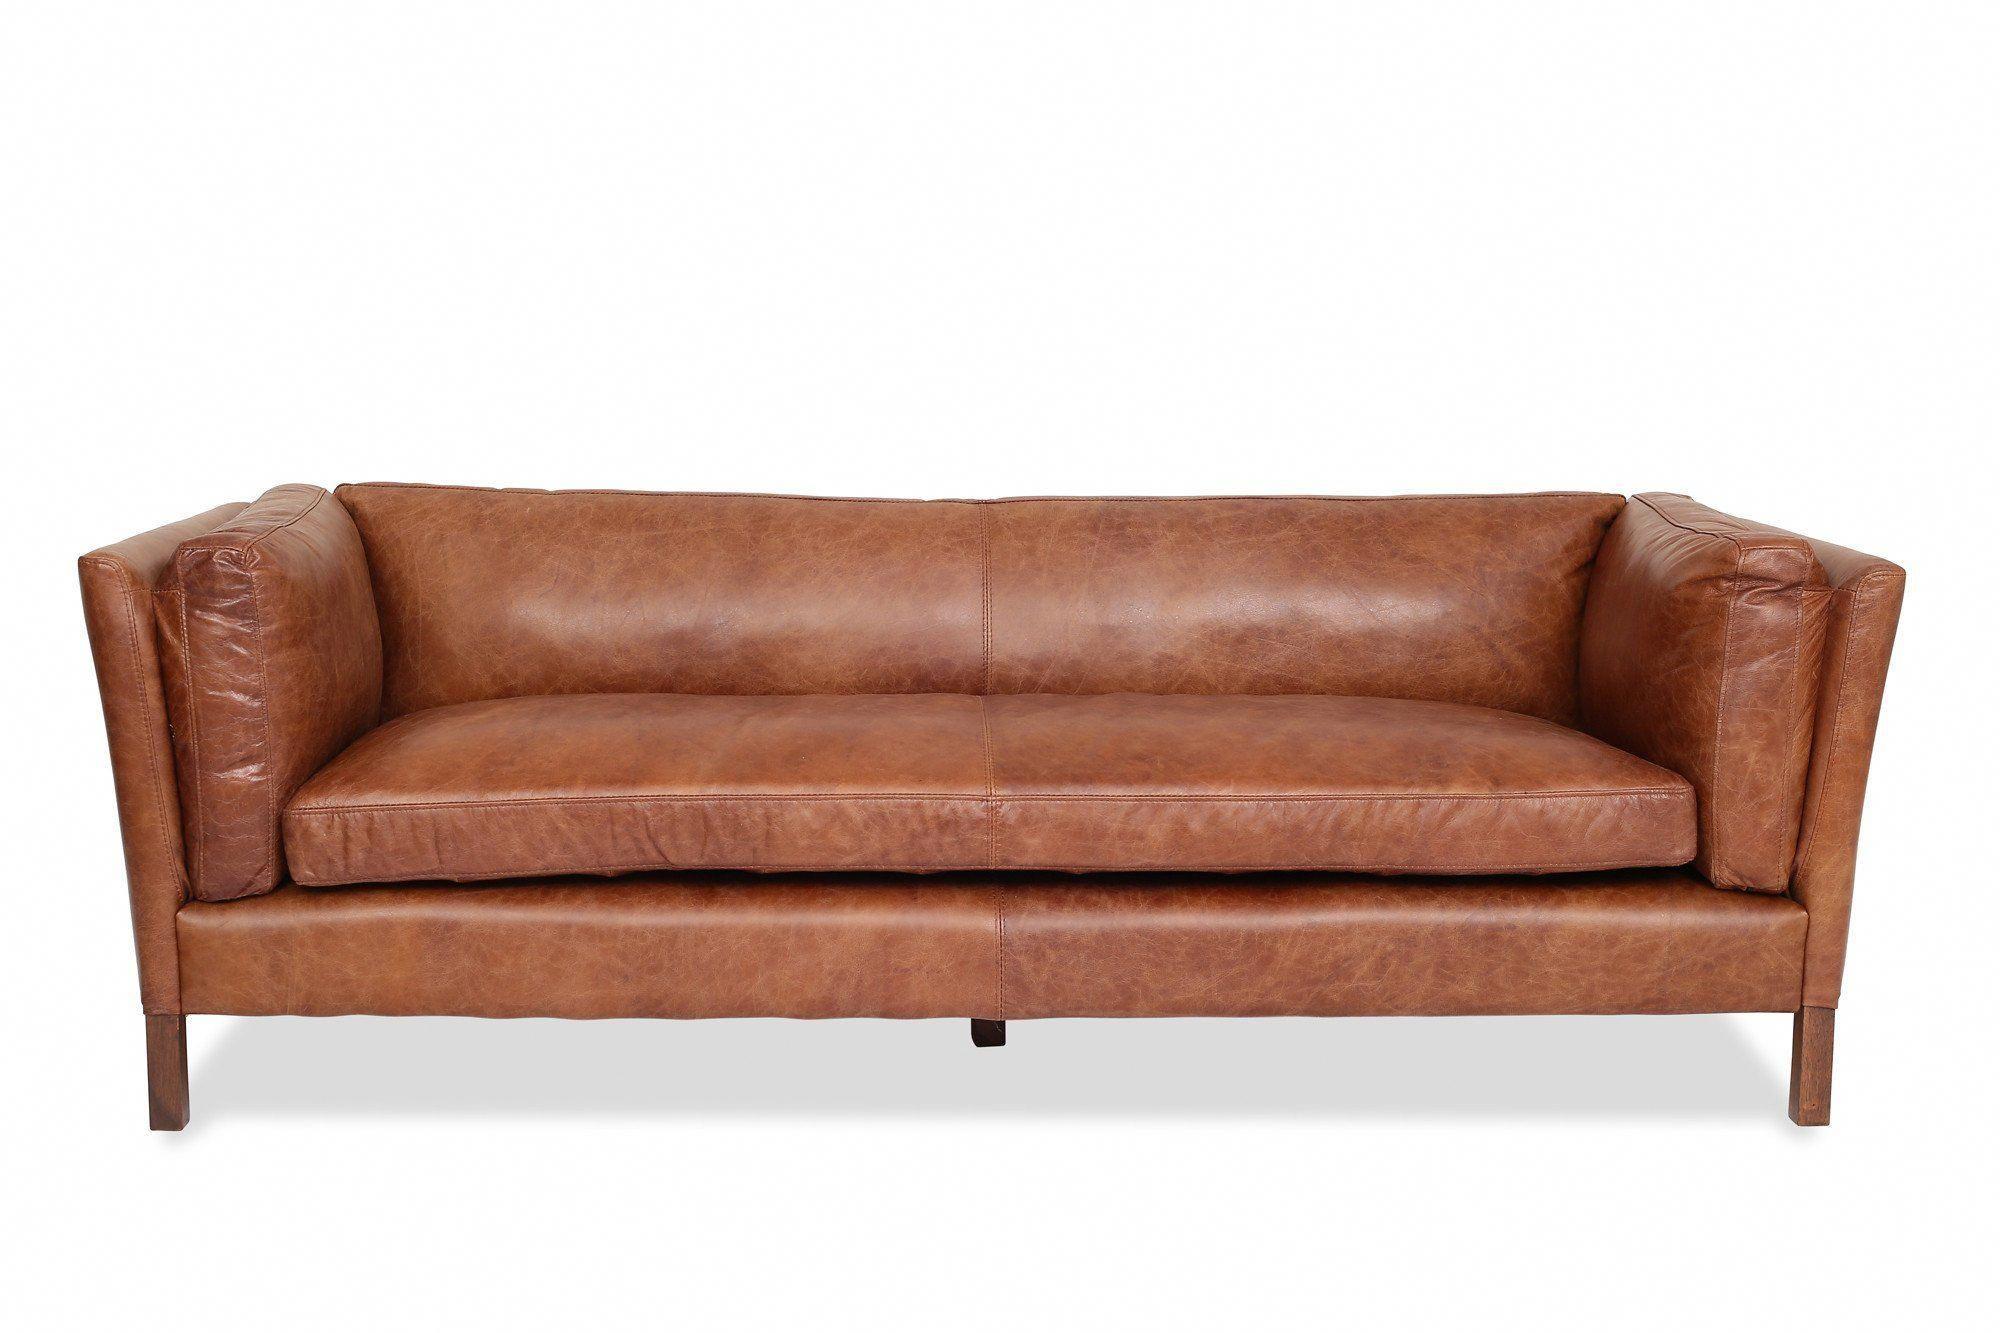 Edloe Finch Finley Cognac Leather Sofa